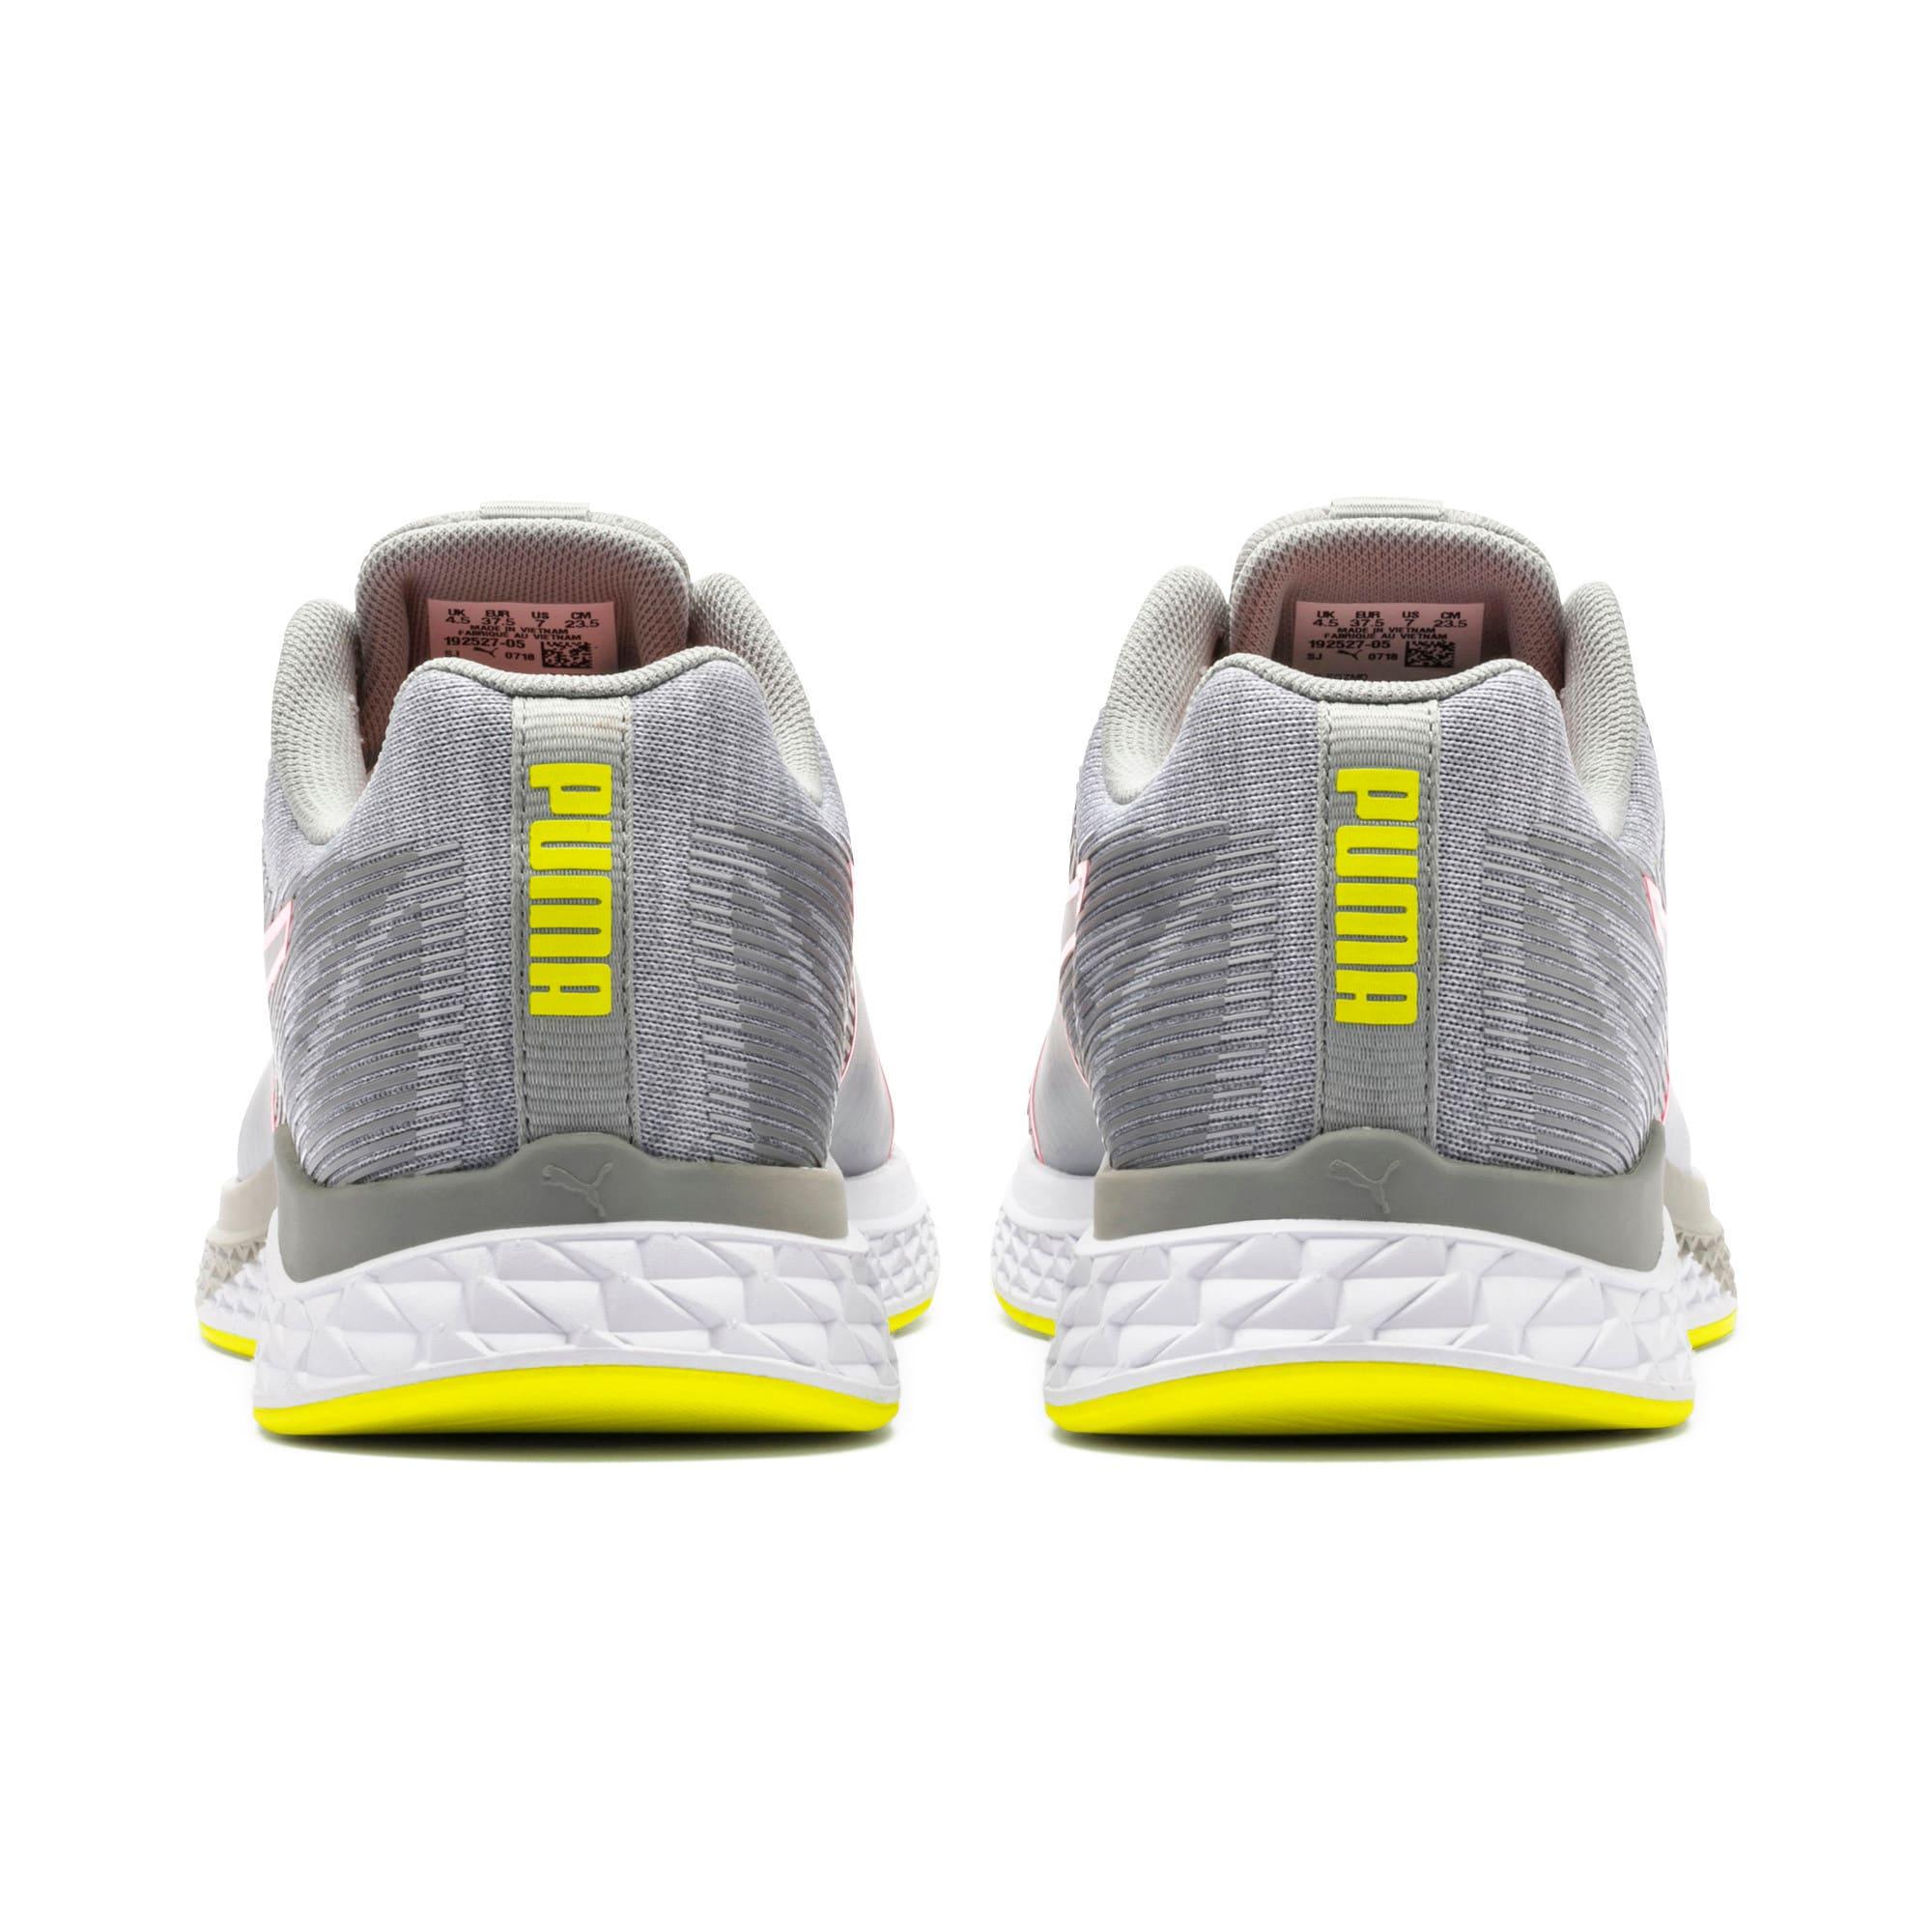 Imagen en miniatura 4 de Zapatillas de running de mujer Speed Sutamina, Quarry-Yellow Alert-Pink, mediana